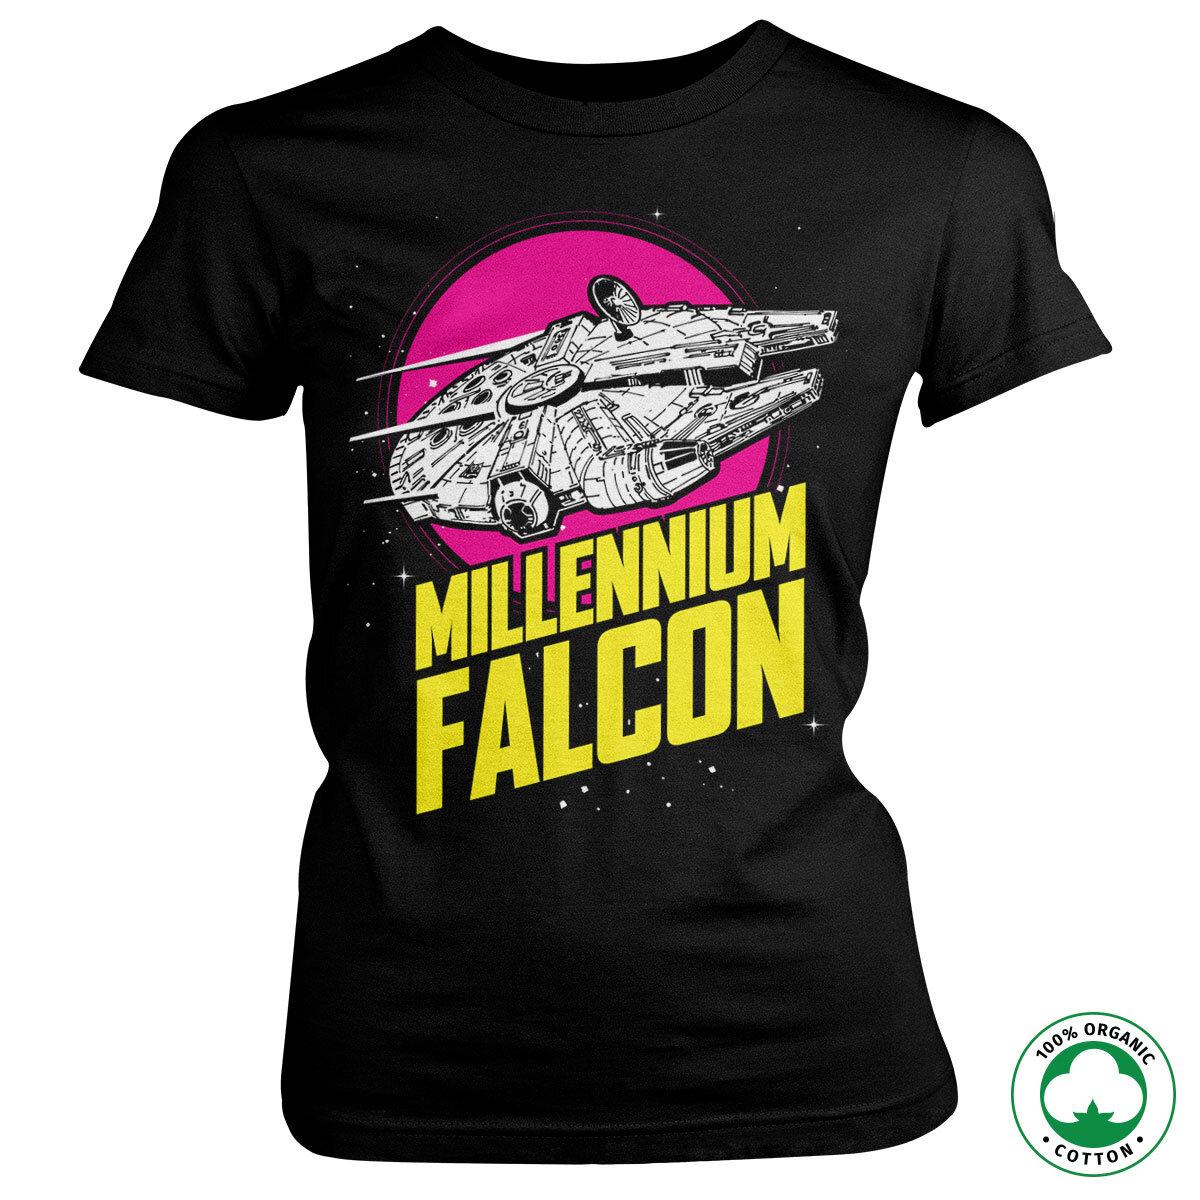 Millennium Falcon Retro Organic Girly Tee